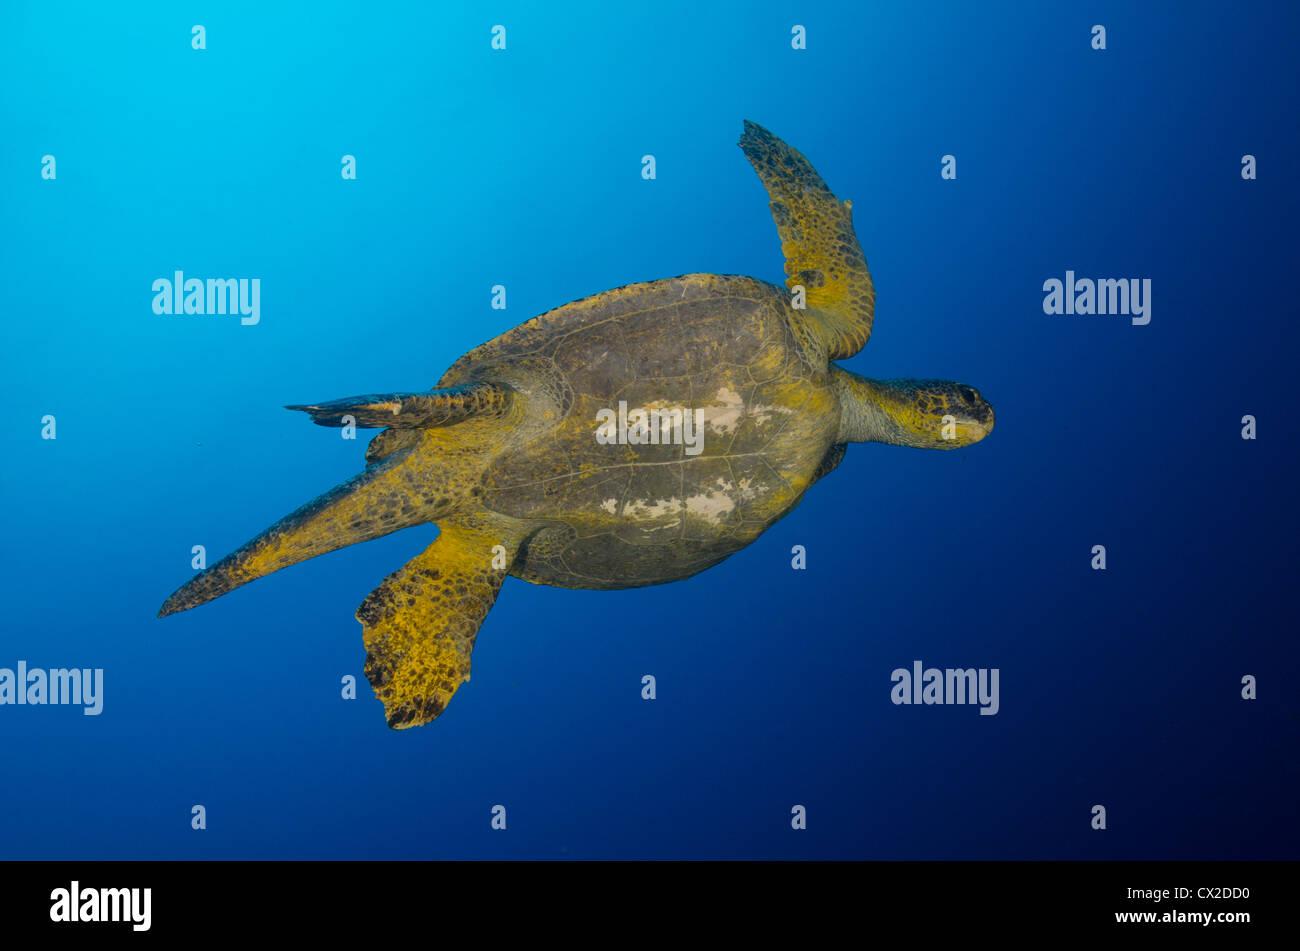 underwater reef in Cocos island, Costa Rica, turtles, blue water, clear water, deep, ocean, sea, sea life, scuba, - Stock Image